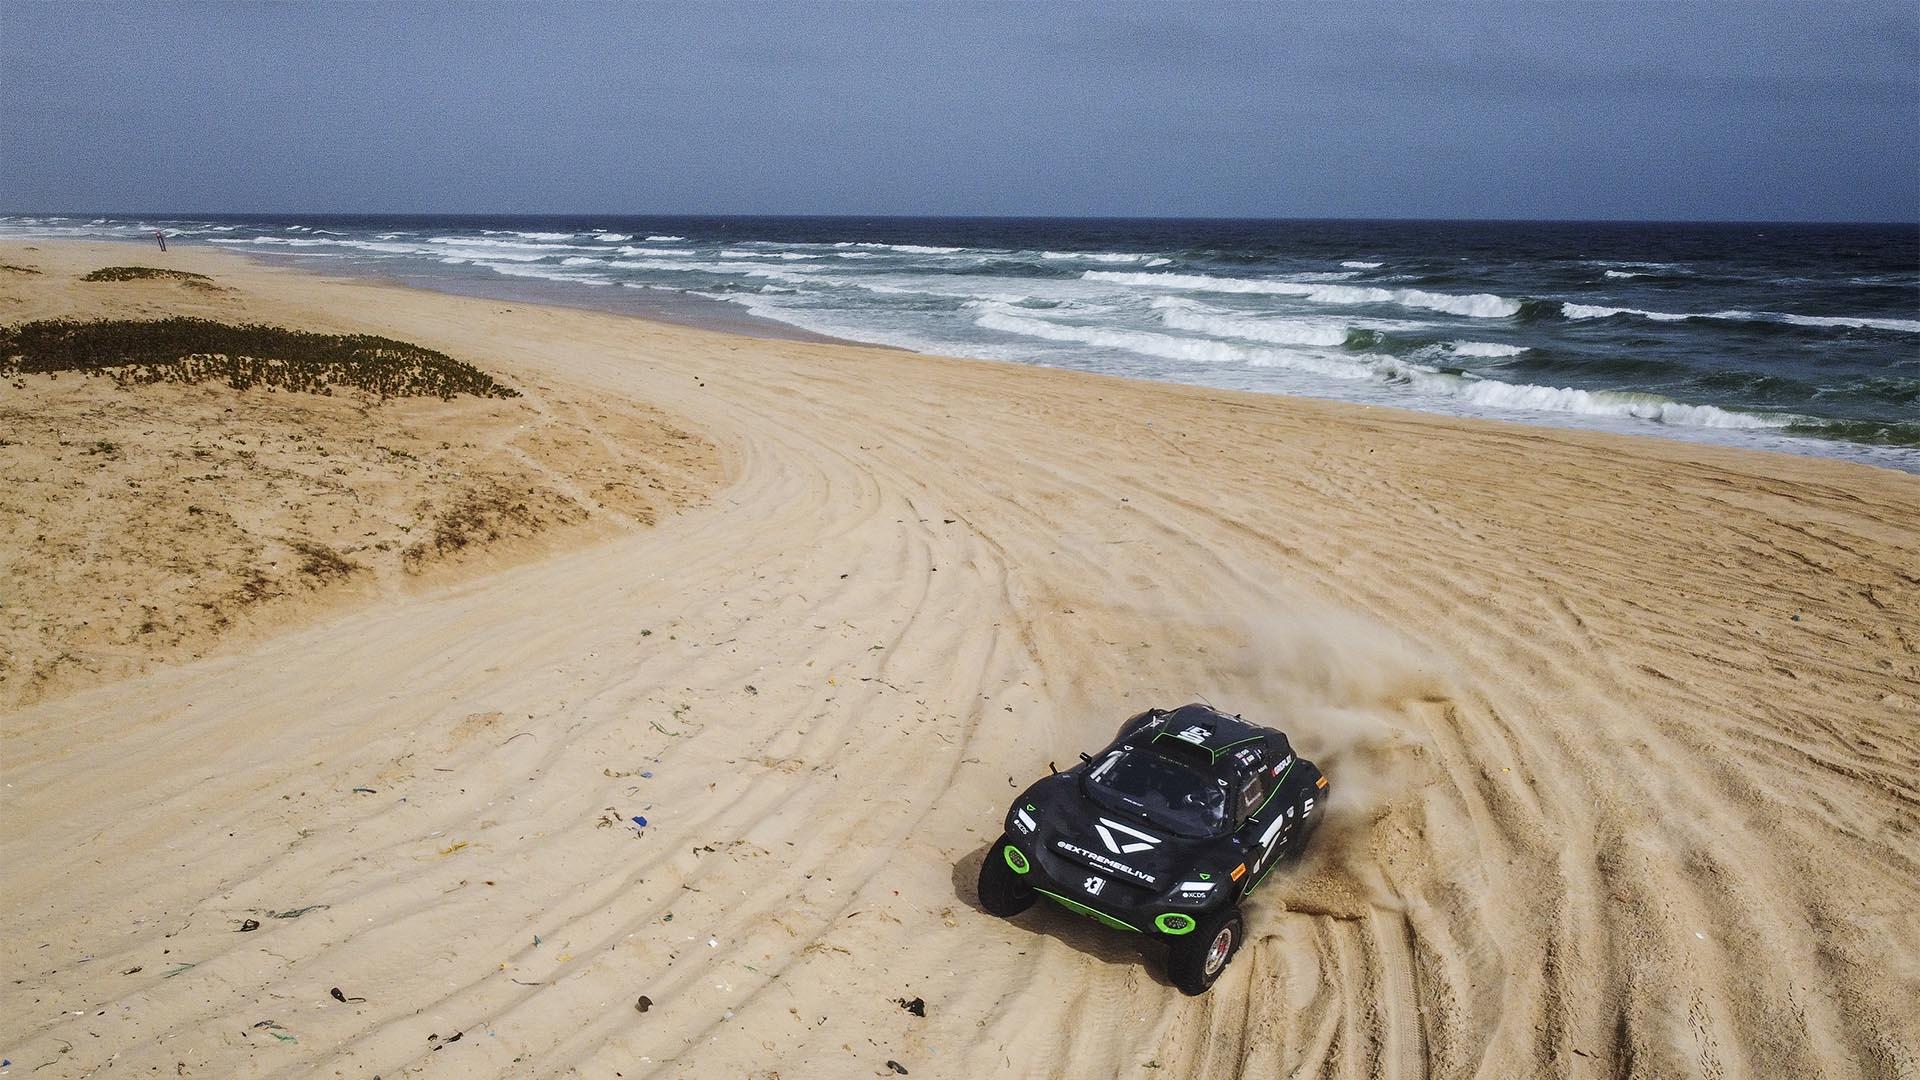 Extreme E: Entra McLaren y se caen los X-Prix de Sudamérica